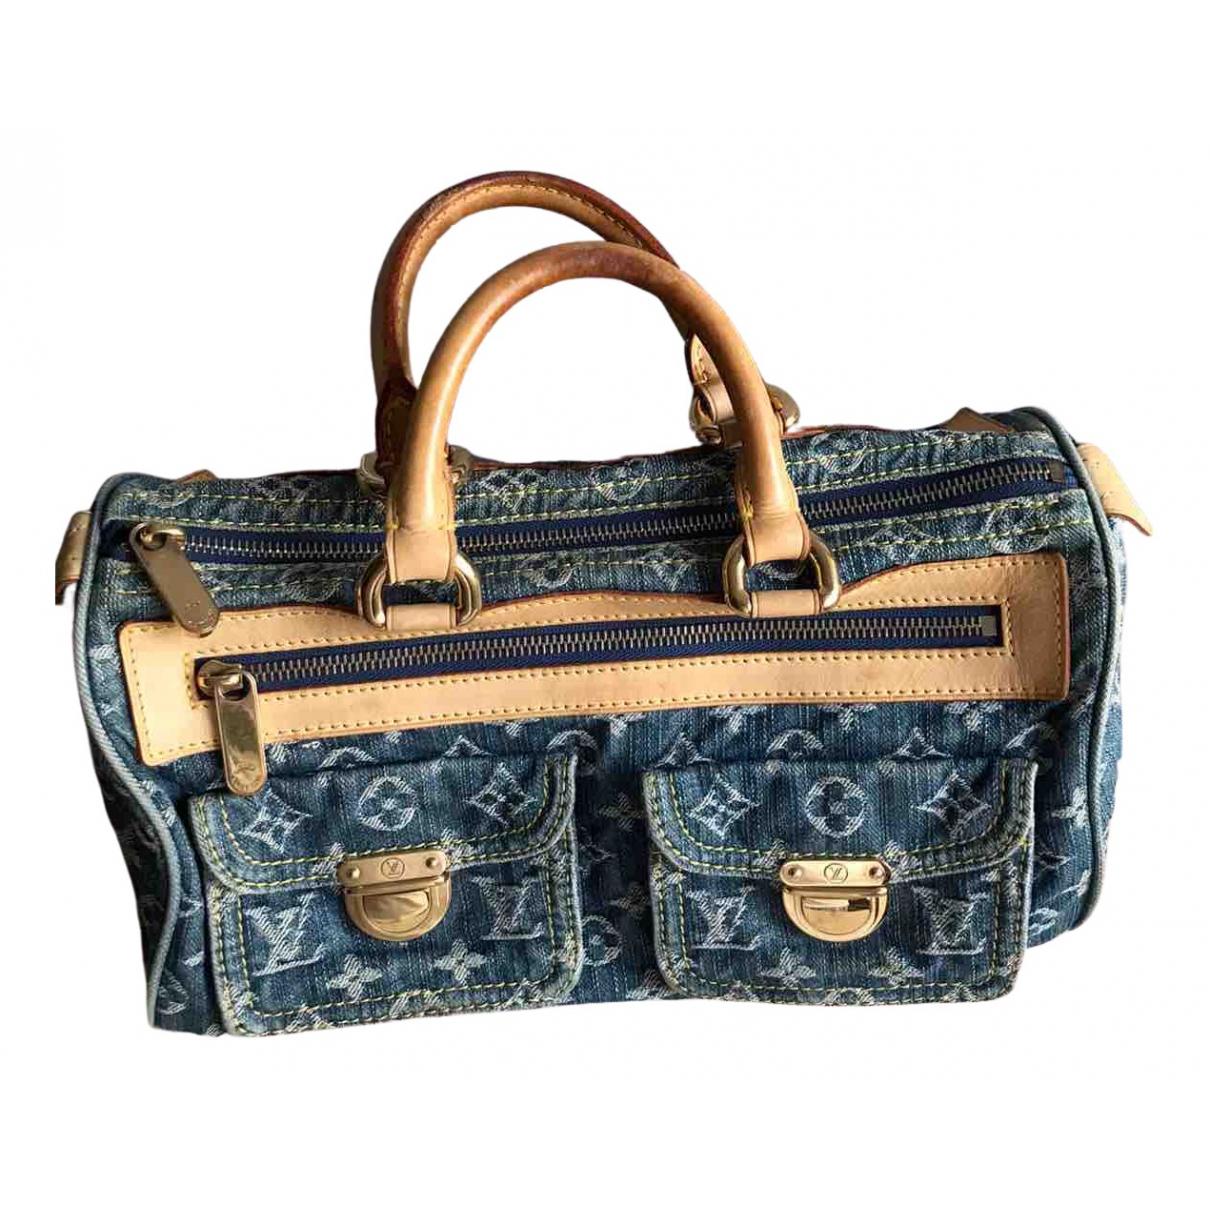 Louis Vuitton Néo speedy Blue Denim - Jeans handbag for Women N